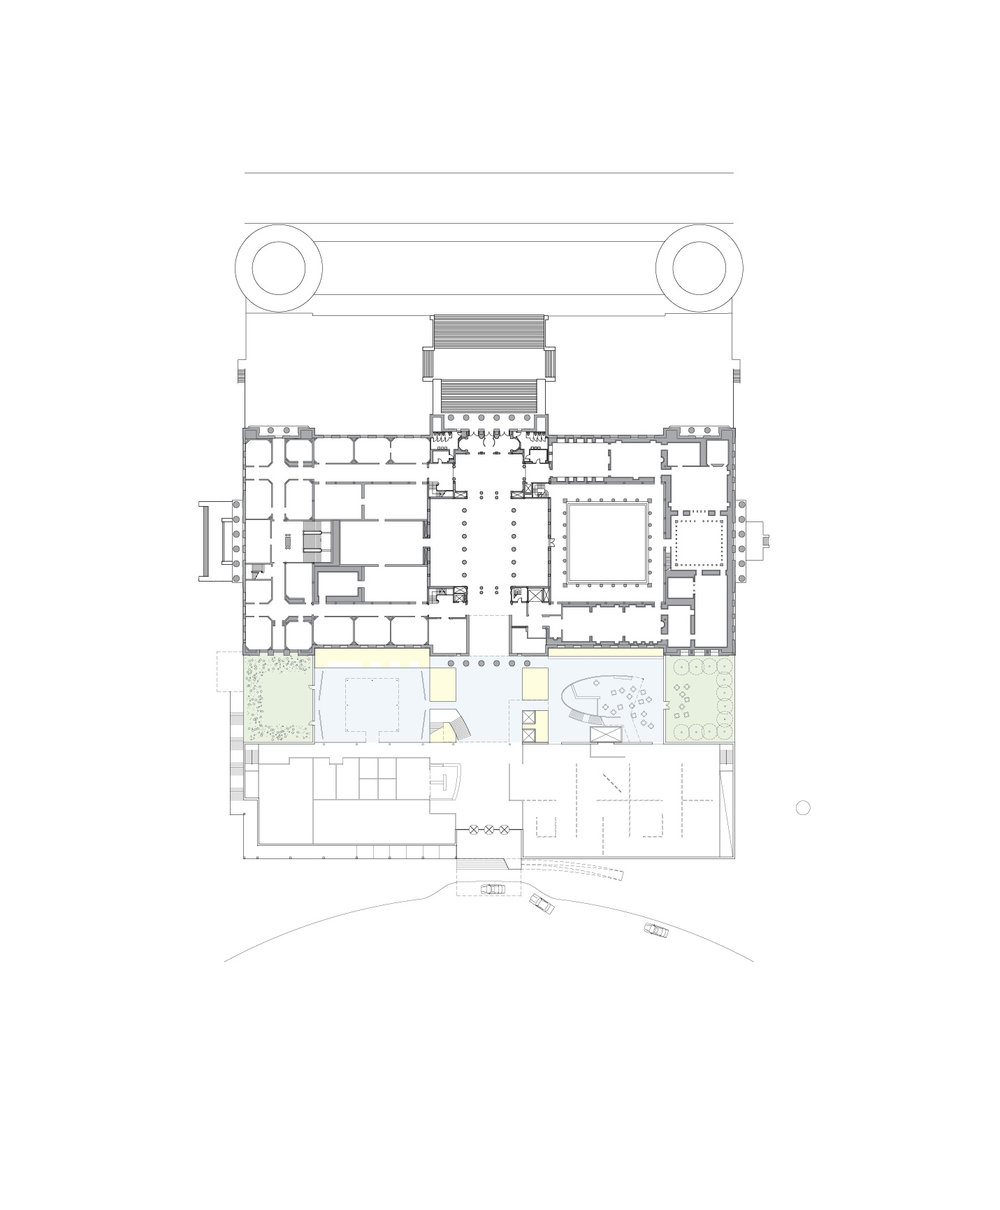 Plan-01-02.jpg